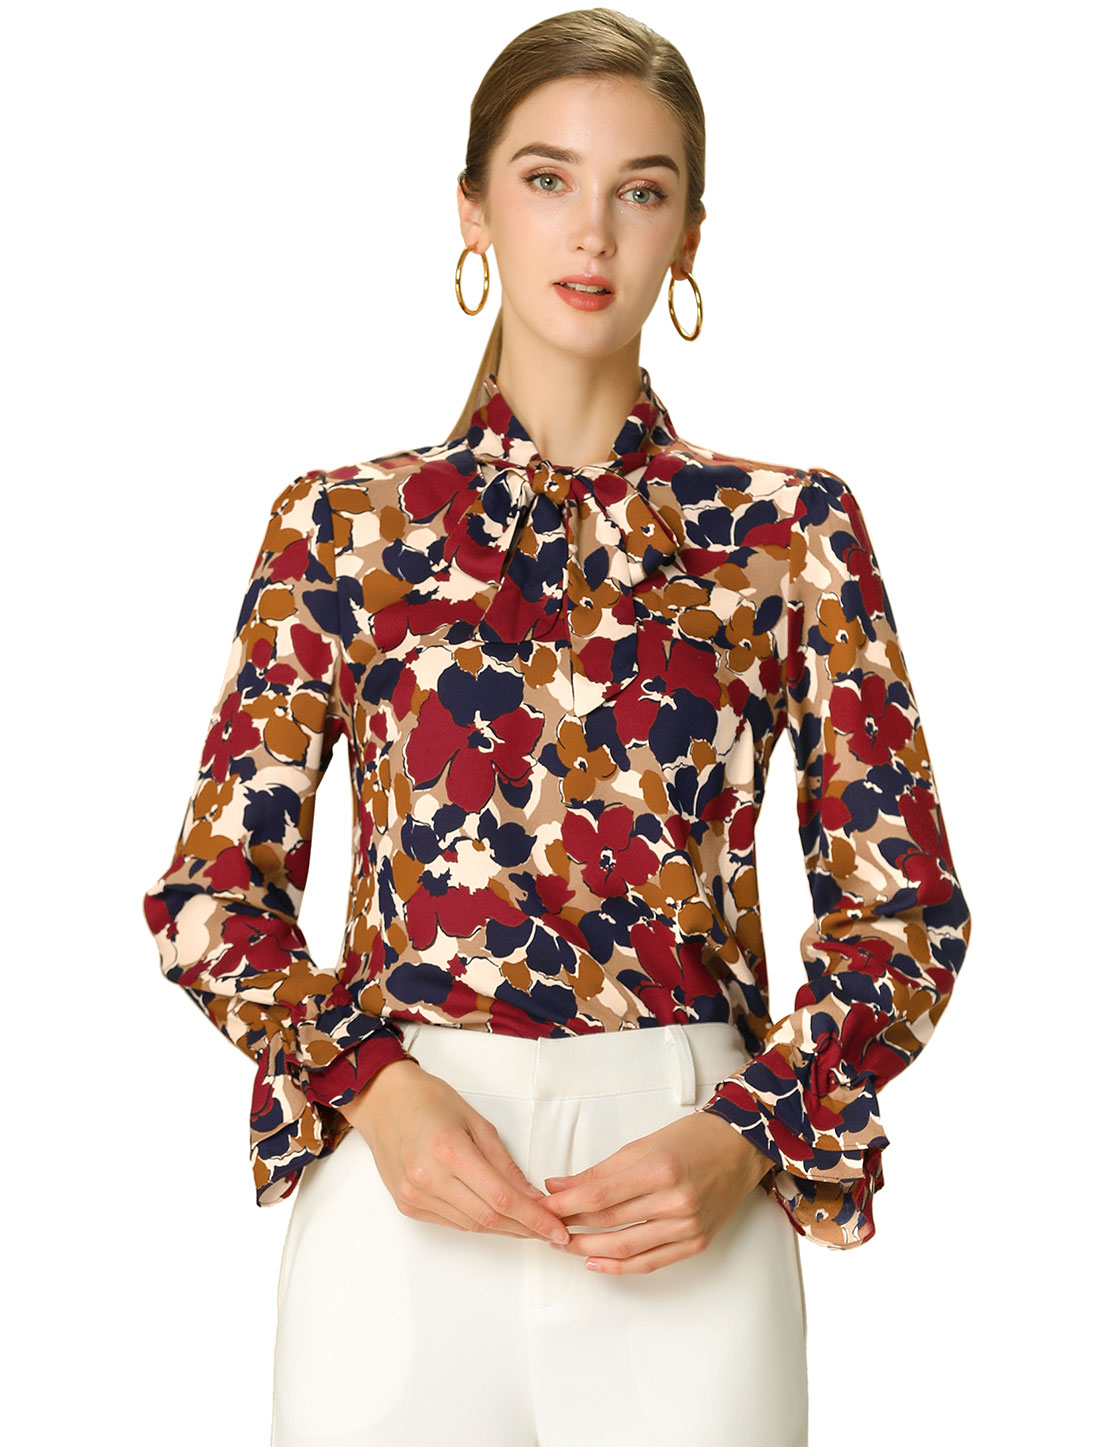 Allegra K Women's Tie Neck Long Sleeve Floral Shirt Red M (US 10)